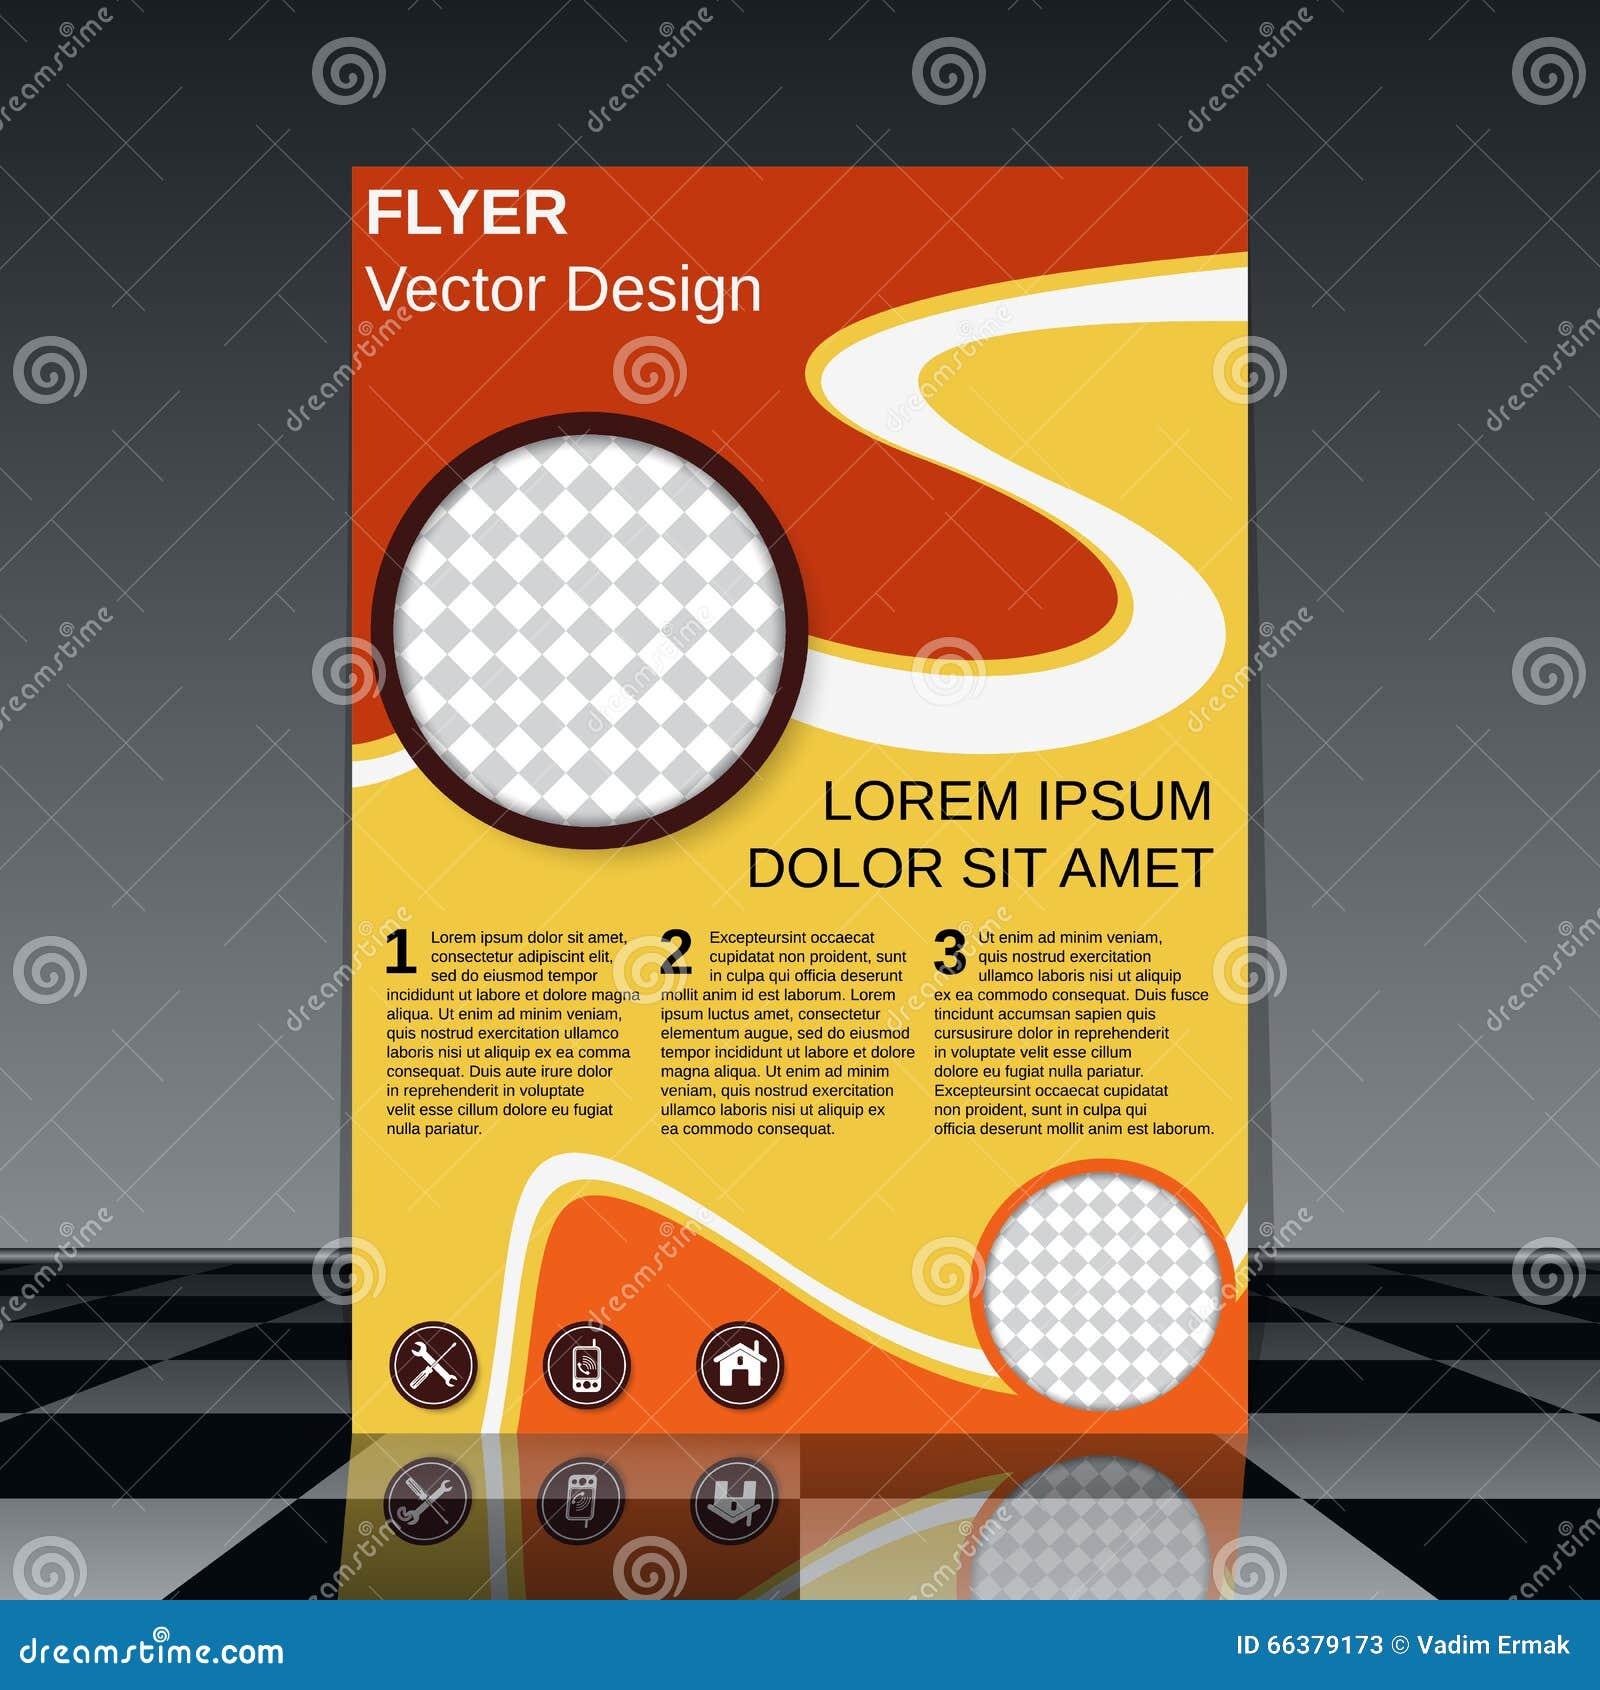 professional flyer vector design stock vector image  professional flyer vector design